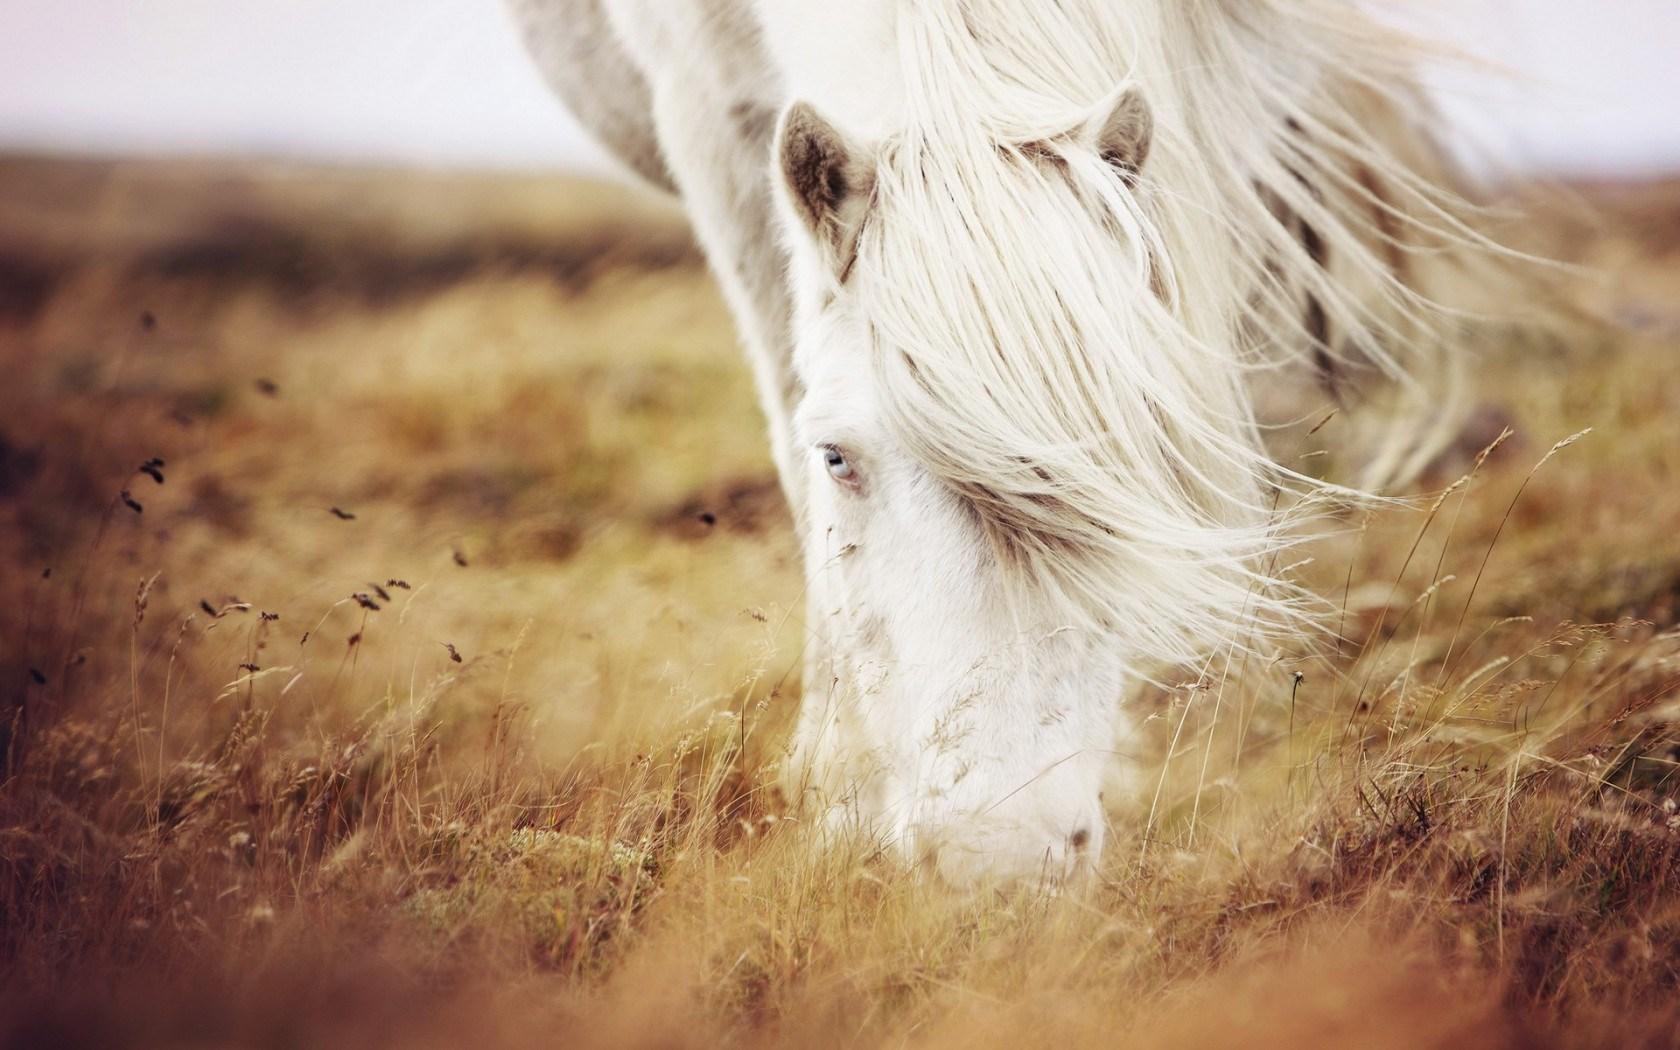 nature field summer grass white horse photo image hd 1680x1050